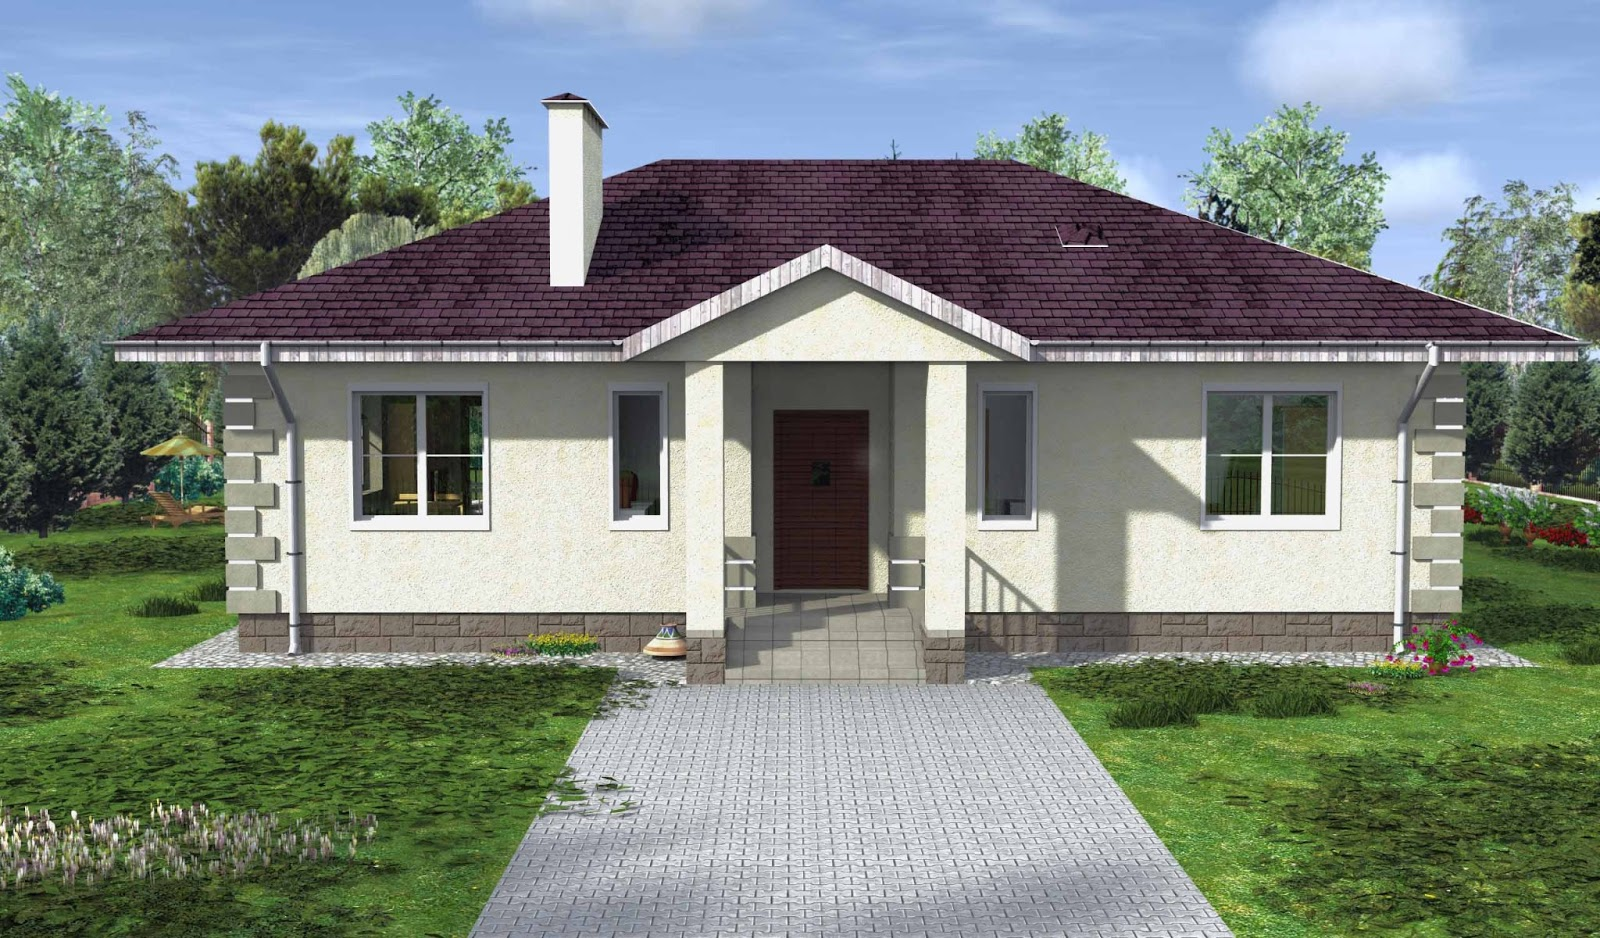 Проект дома пеноблоков